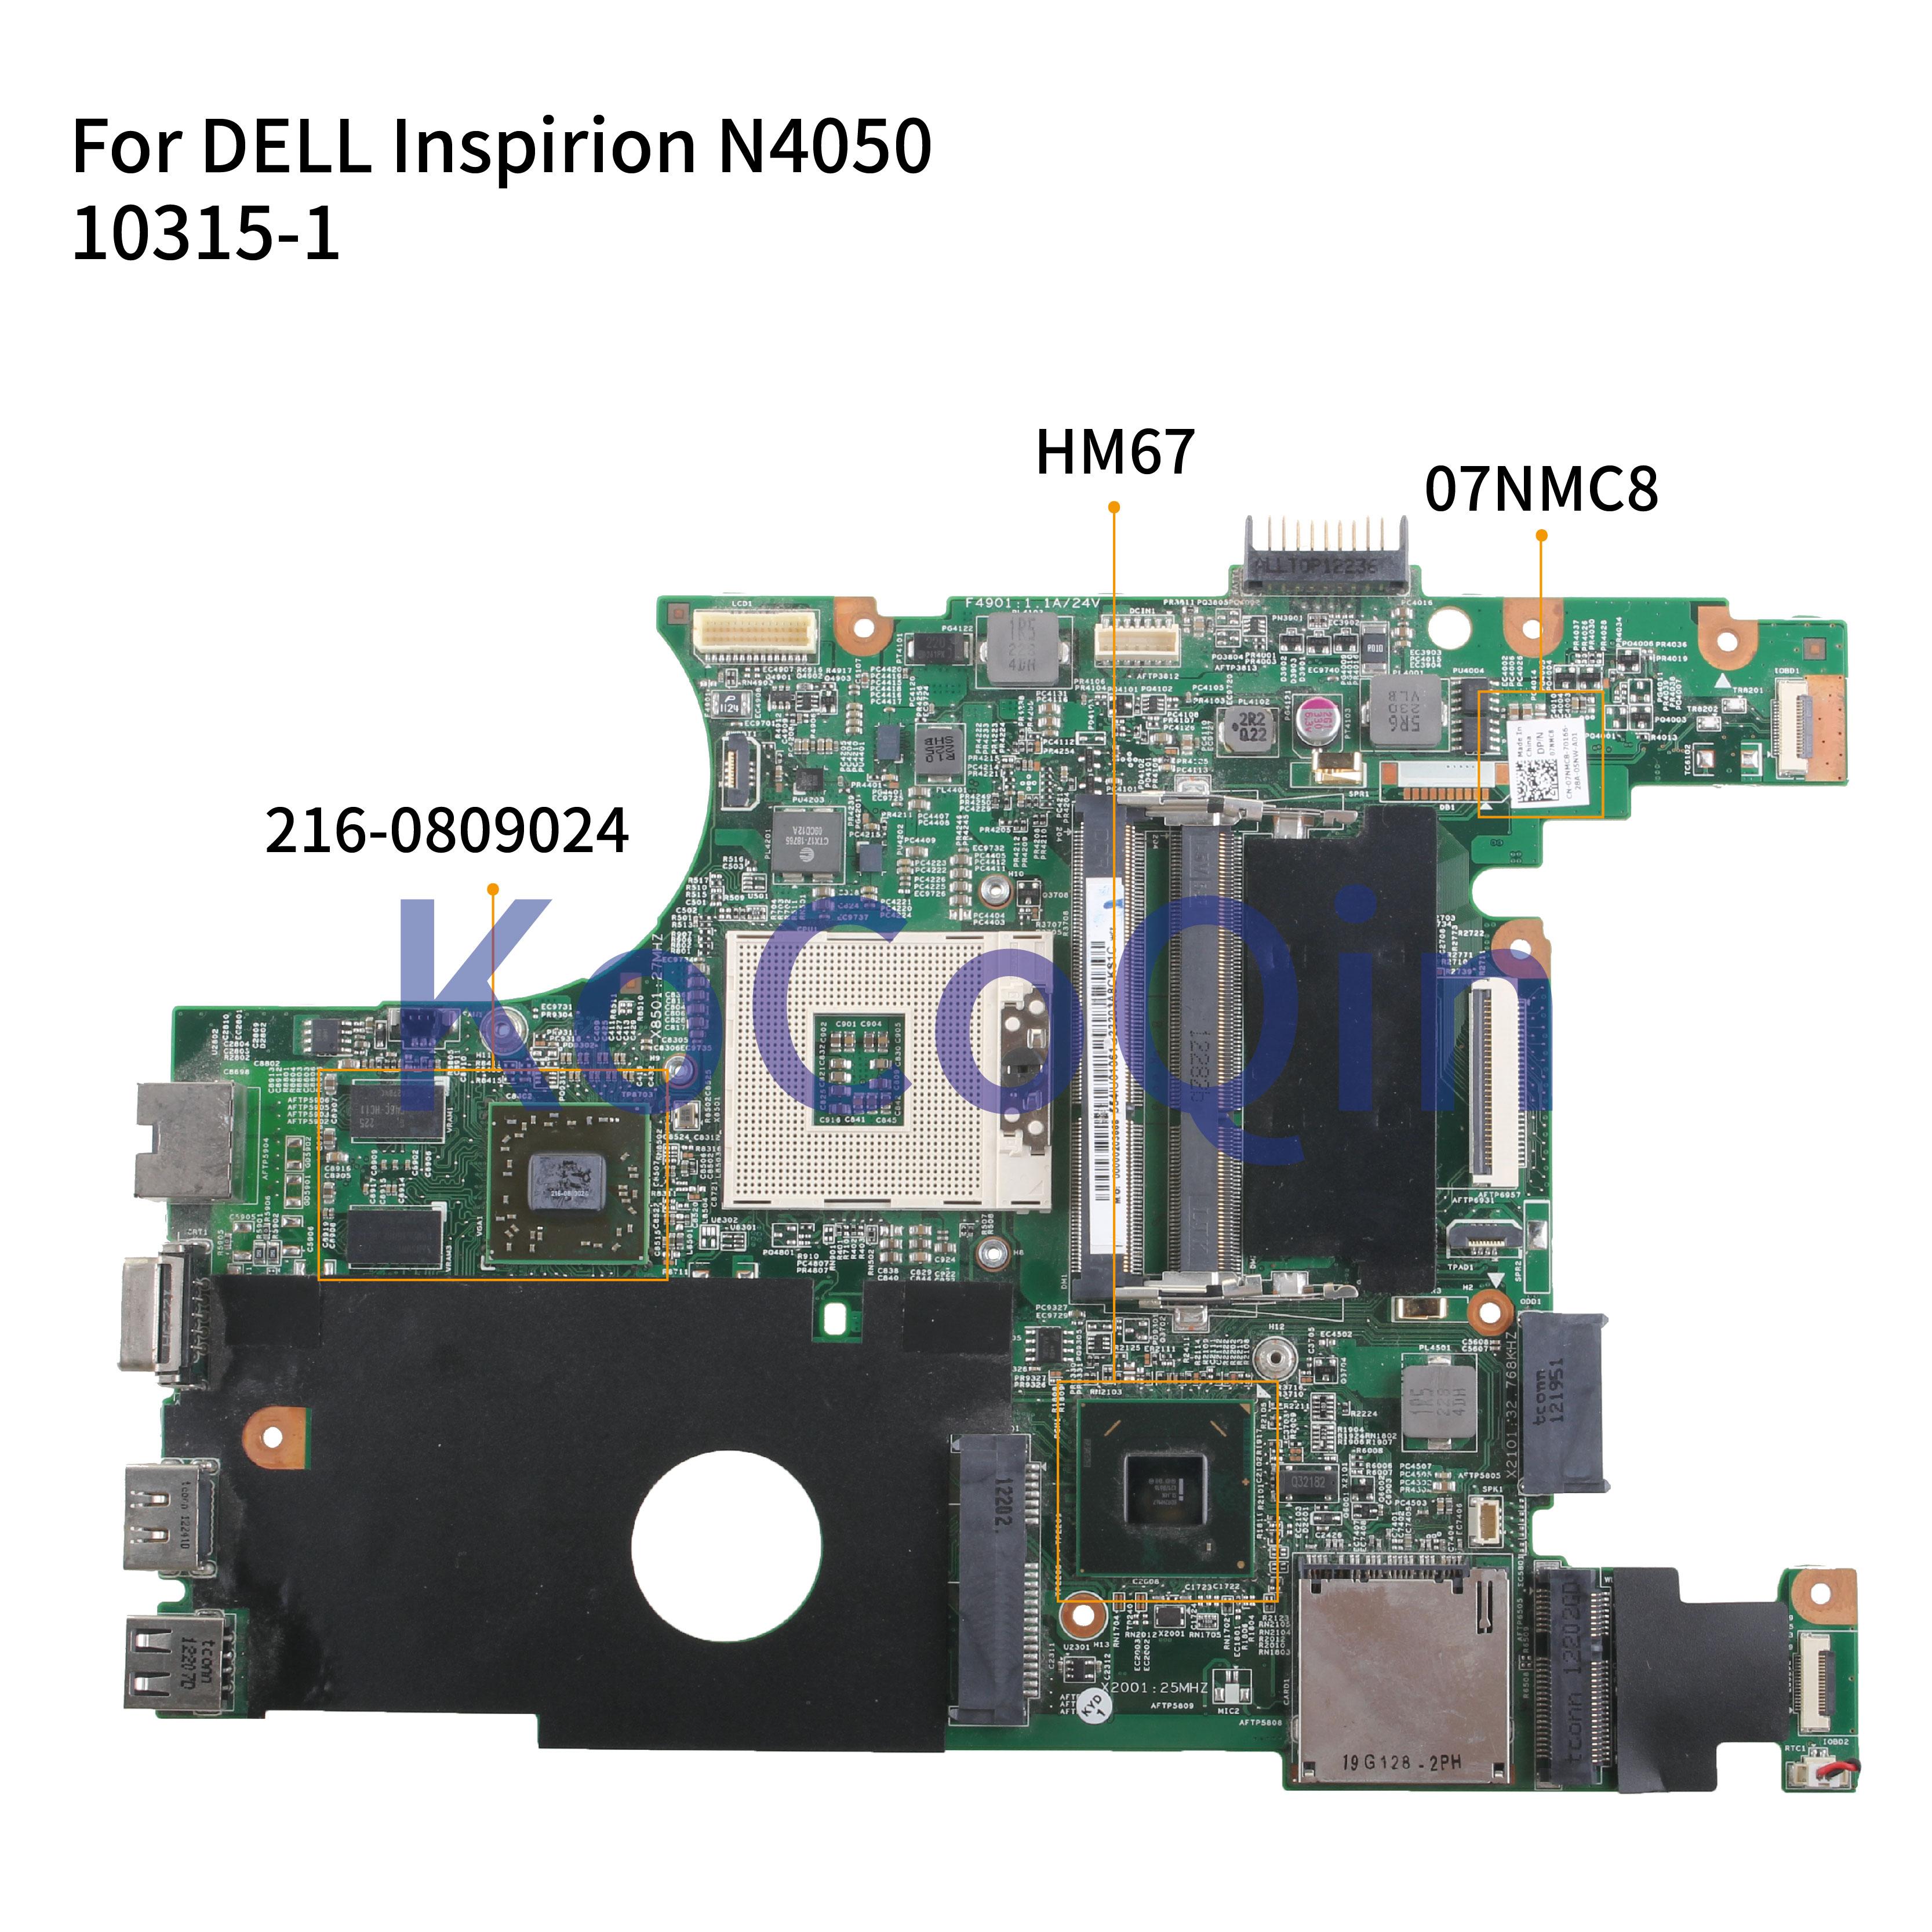 KoCoQin Laptop motherboard Für DELL Inspiron 14R N4050 HD6470M Mainboard CN-07NMC8 07NMC8 48.4IU15.01M 10315-1M 216-0809024